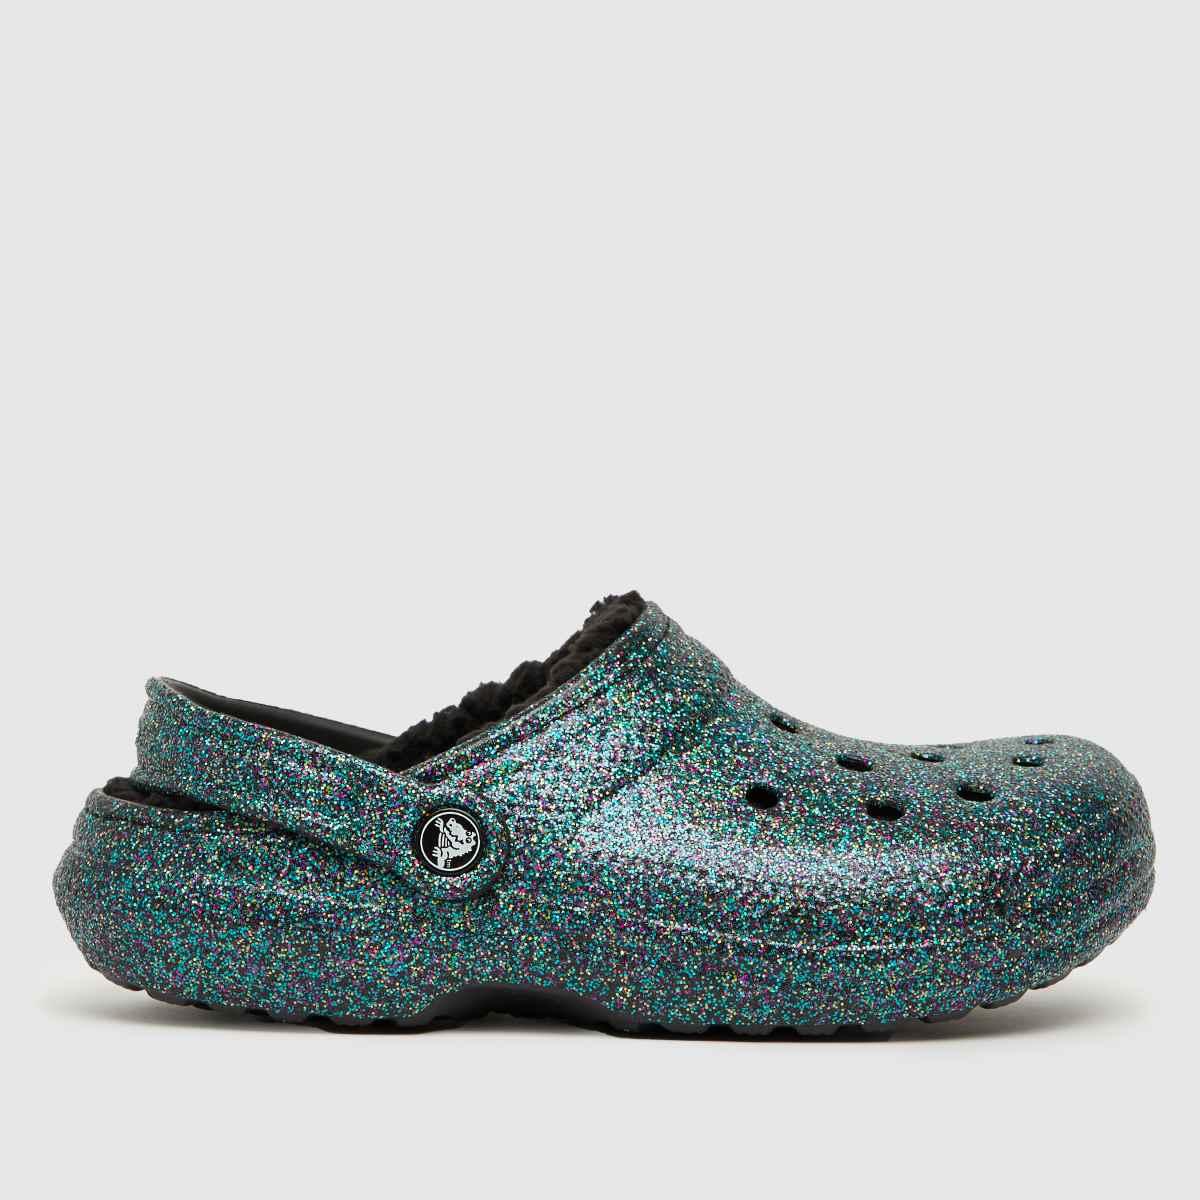 Crocs Navy Classic Lined Glitter Sandals